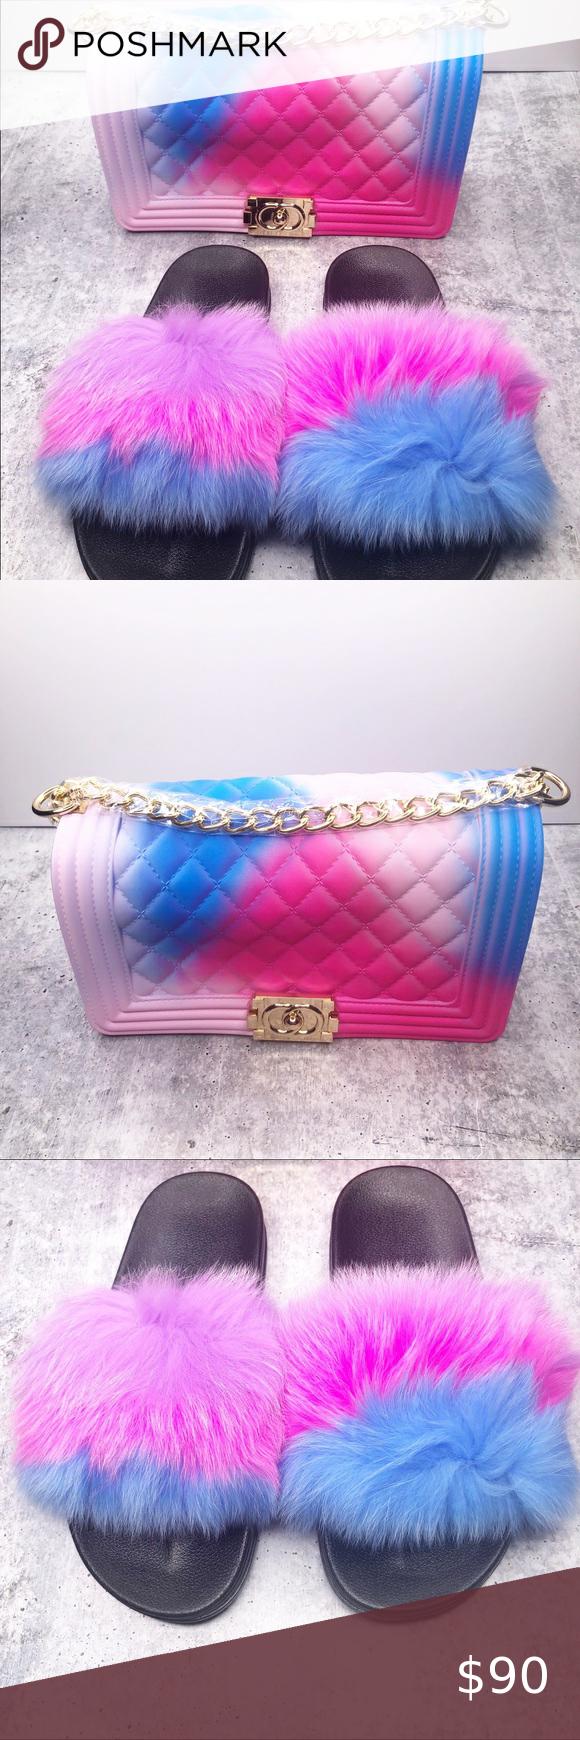 matching jelly purse bag faux fur slides shoes set in 2020 jelly purse faux fur slides blue purse pinterest